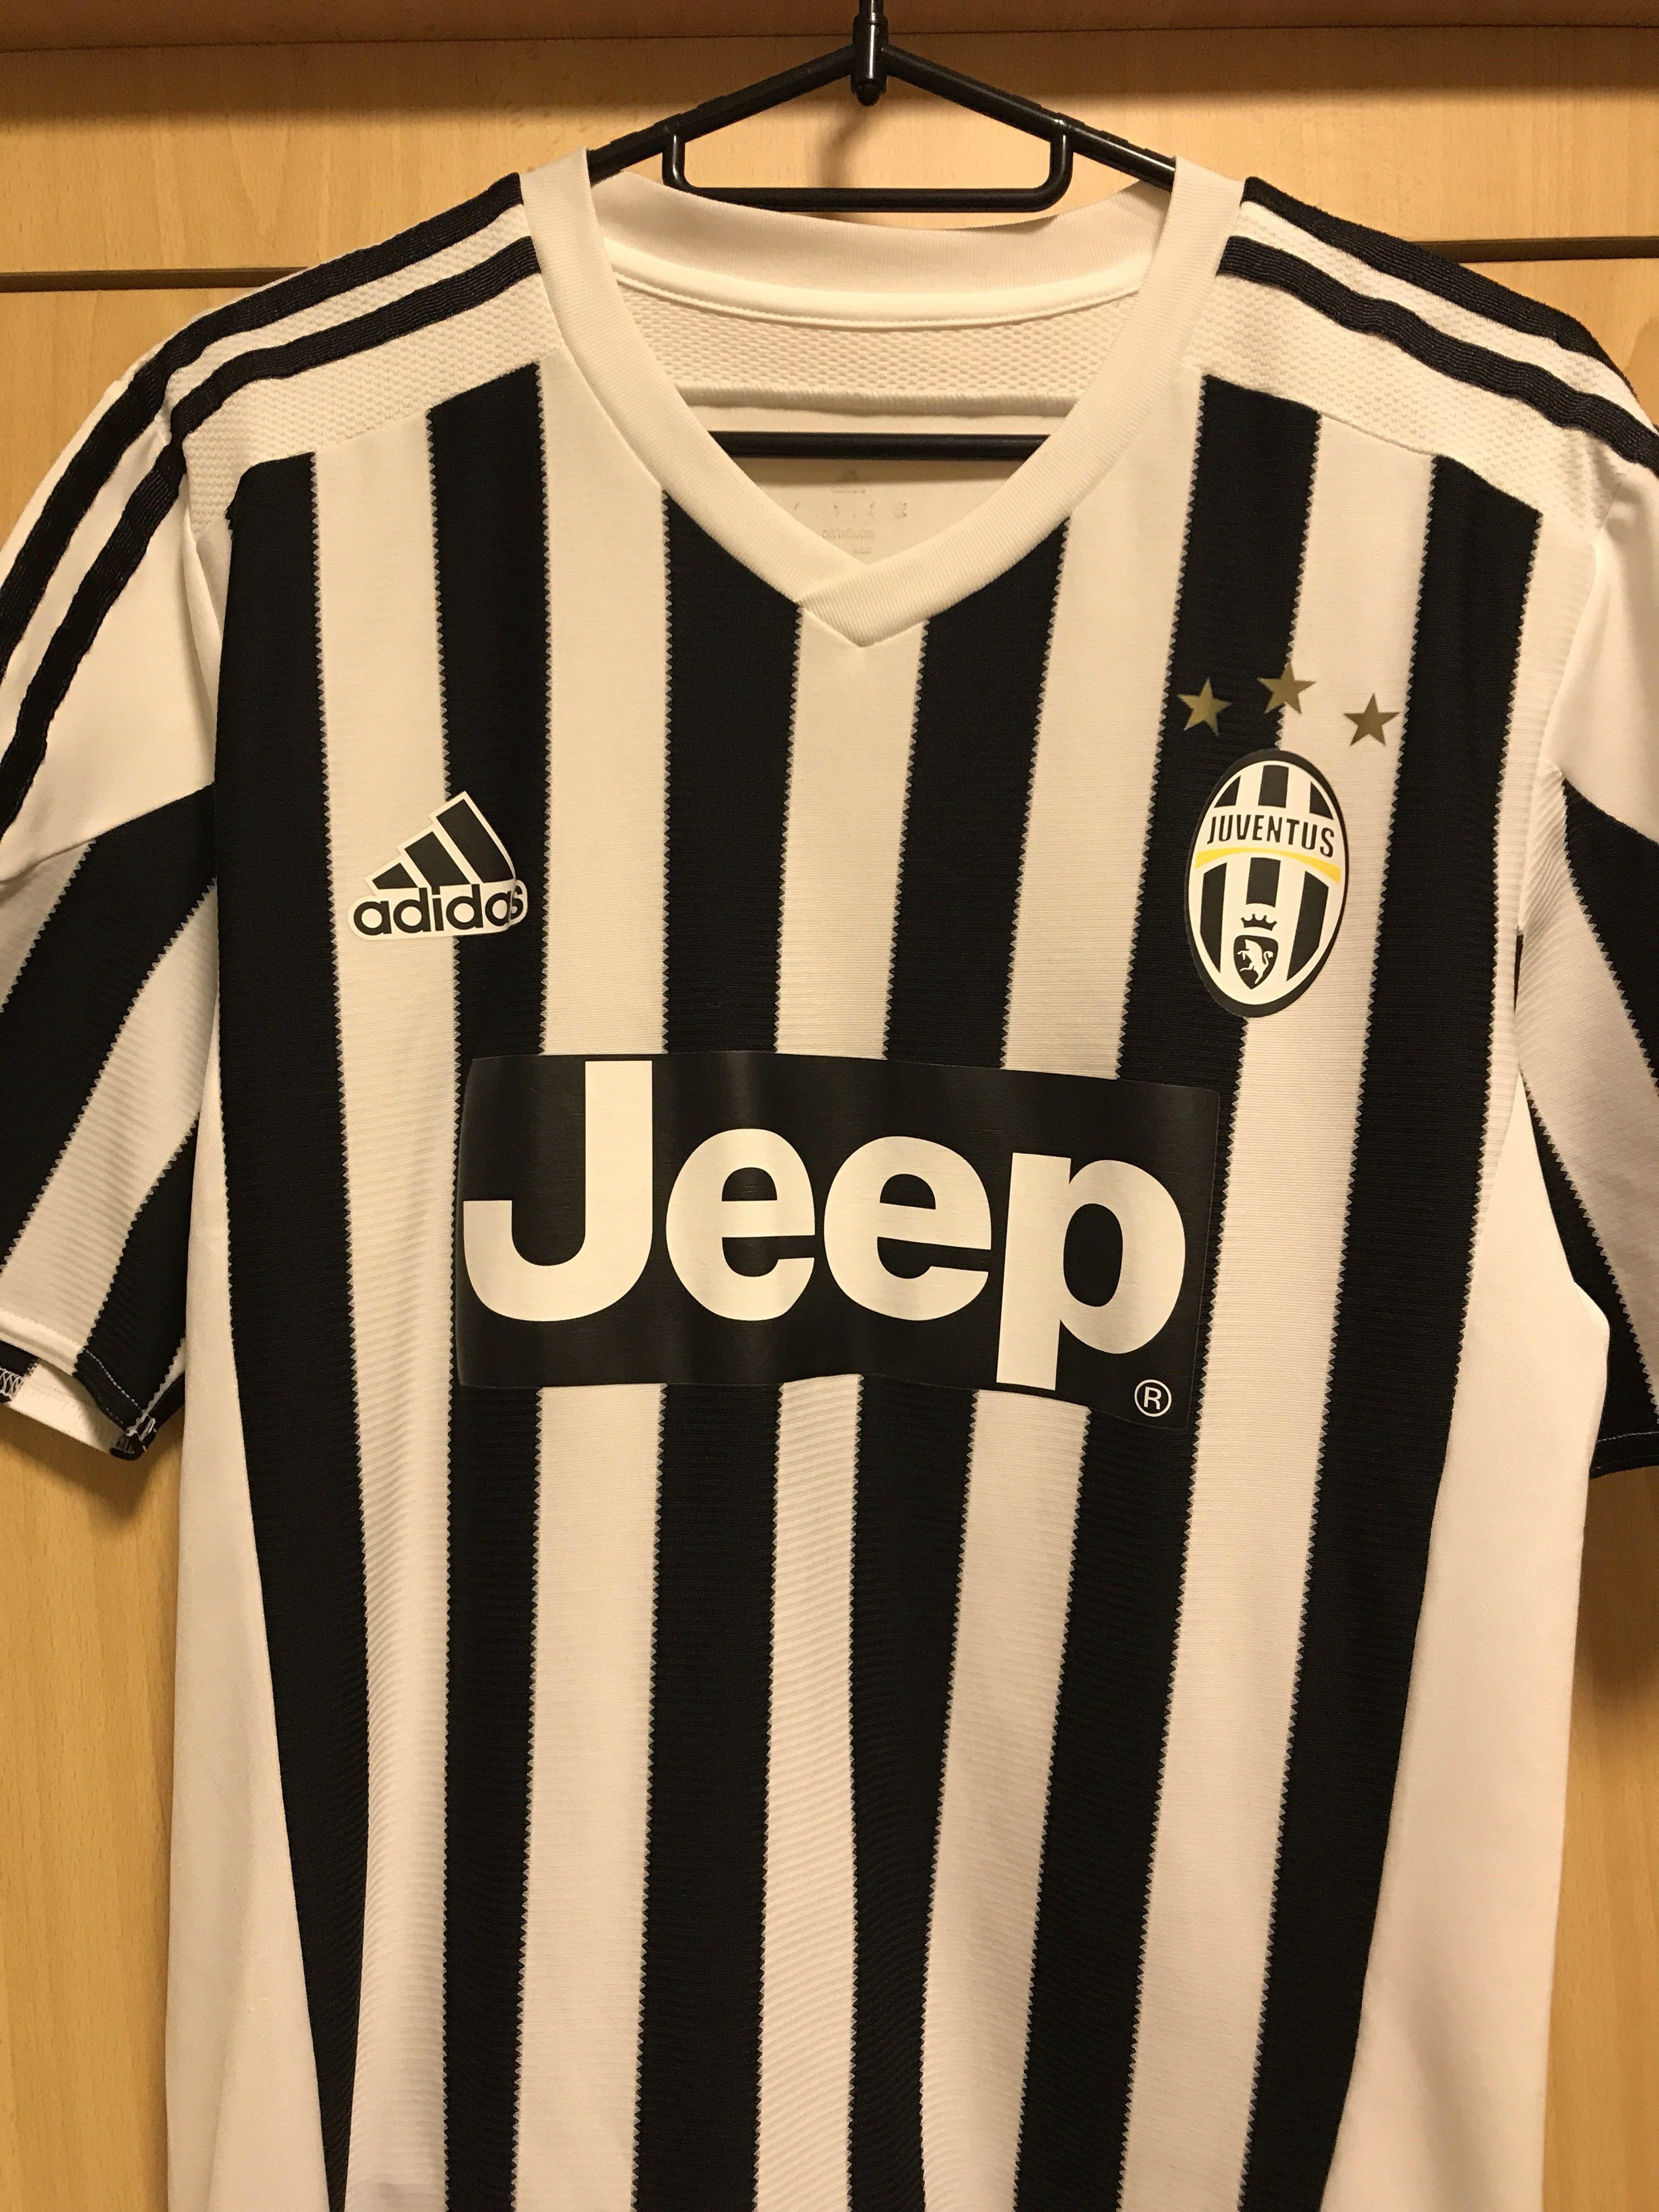 pretty nice 54e7b 913e7 Juventus 16/17 adizero home jersey, Men's Fashion, Clothes ...